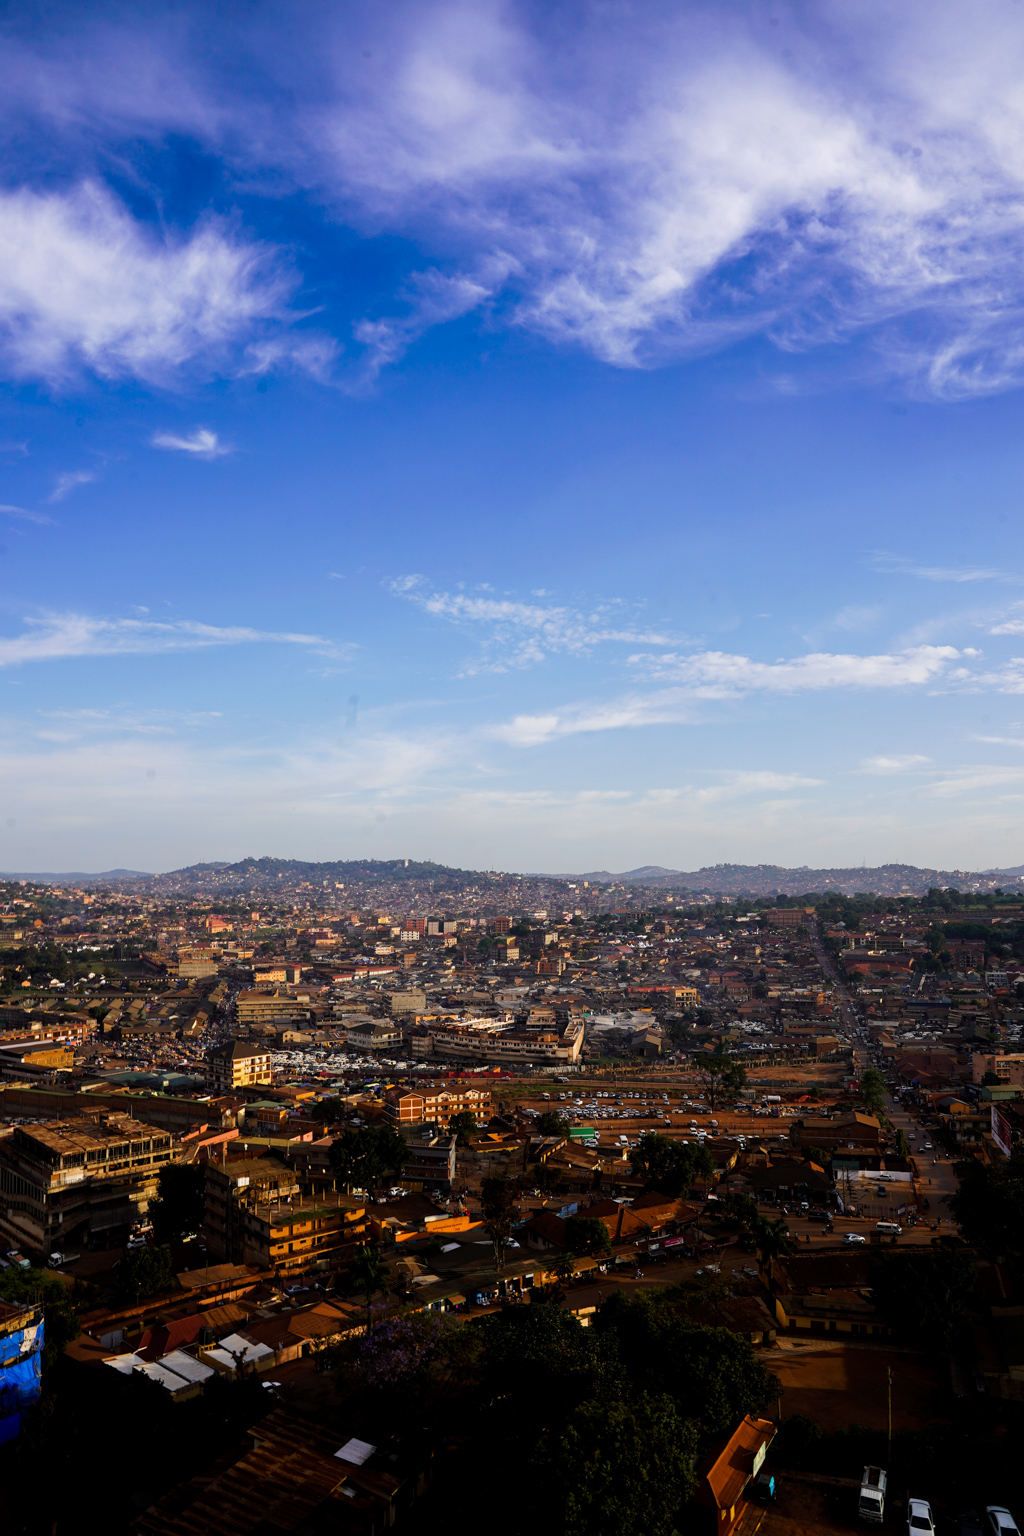 Highlights in Uganda: Gorillas, Löwen, Giraffen & Wasserprojekte 171